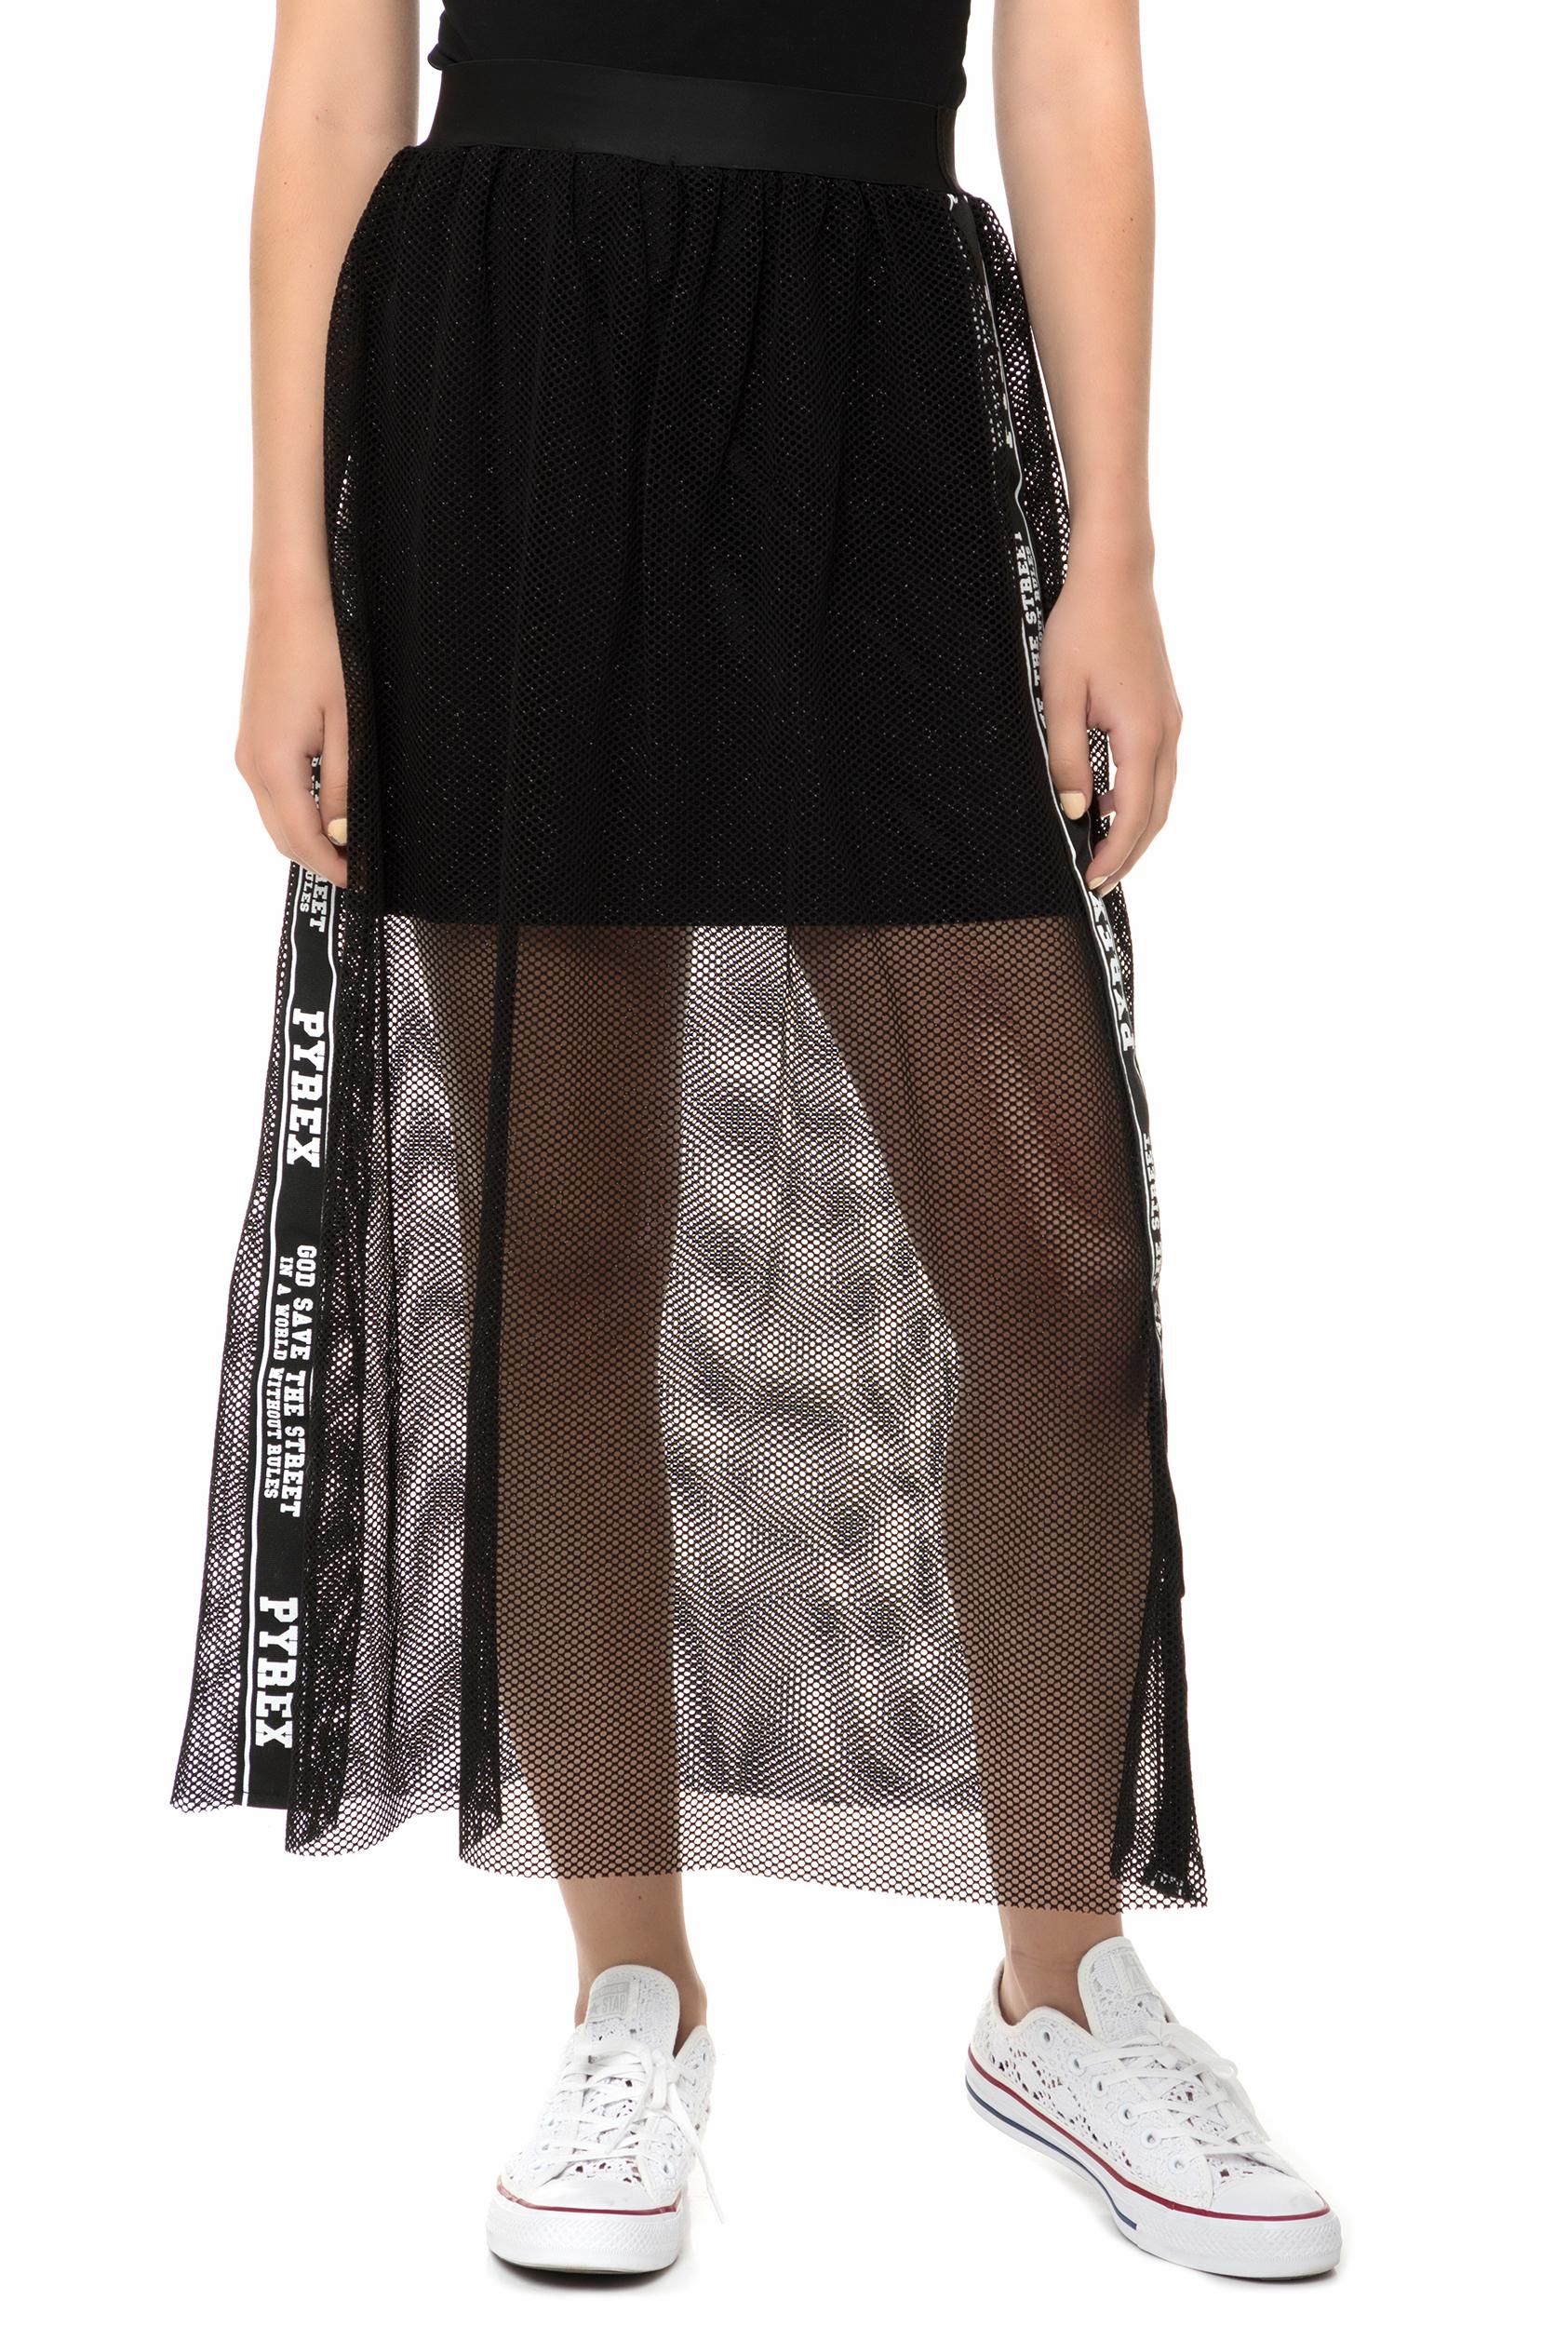 PYREX - Γυναικεία μάξι φούστα PYREX μαύρη